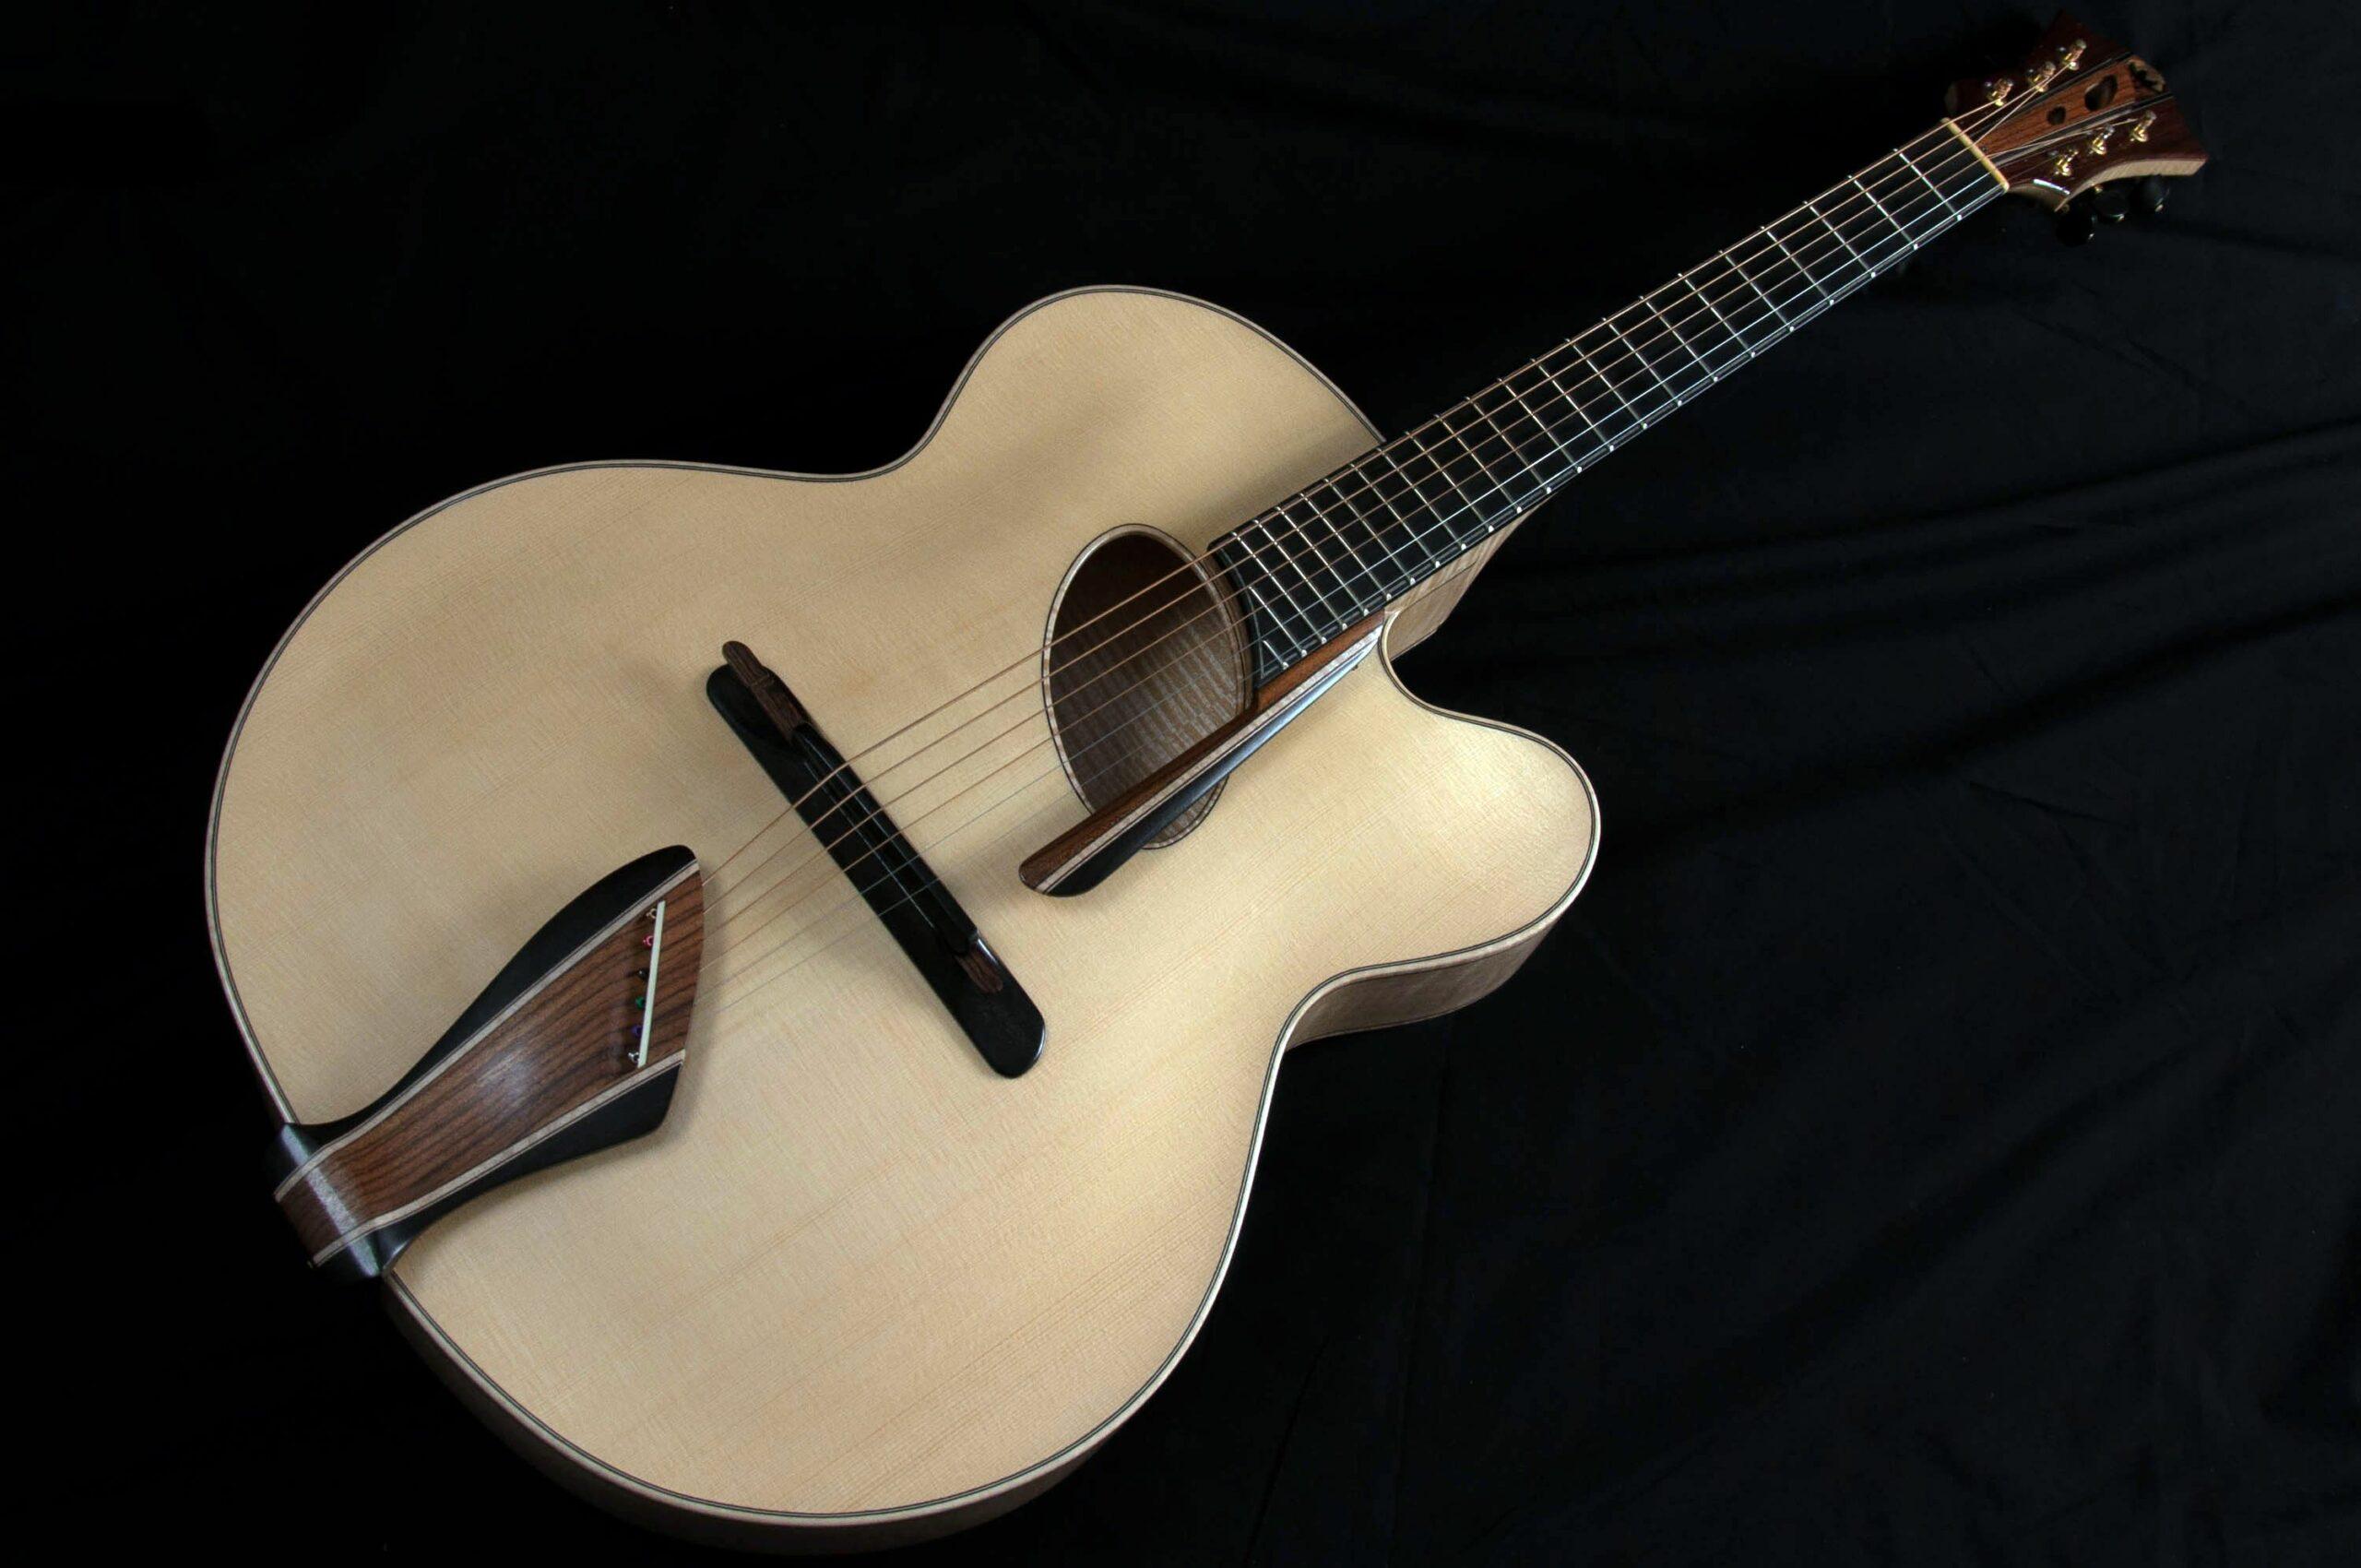 mirabella oval hole guitar